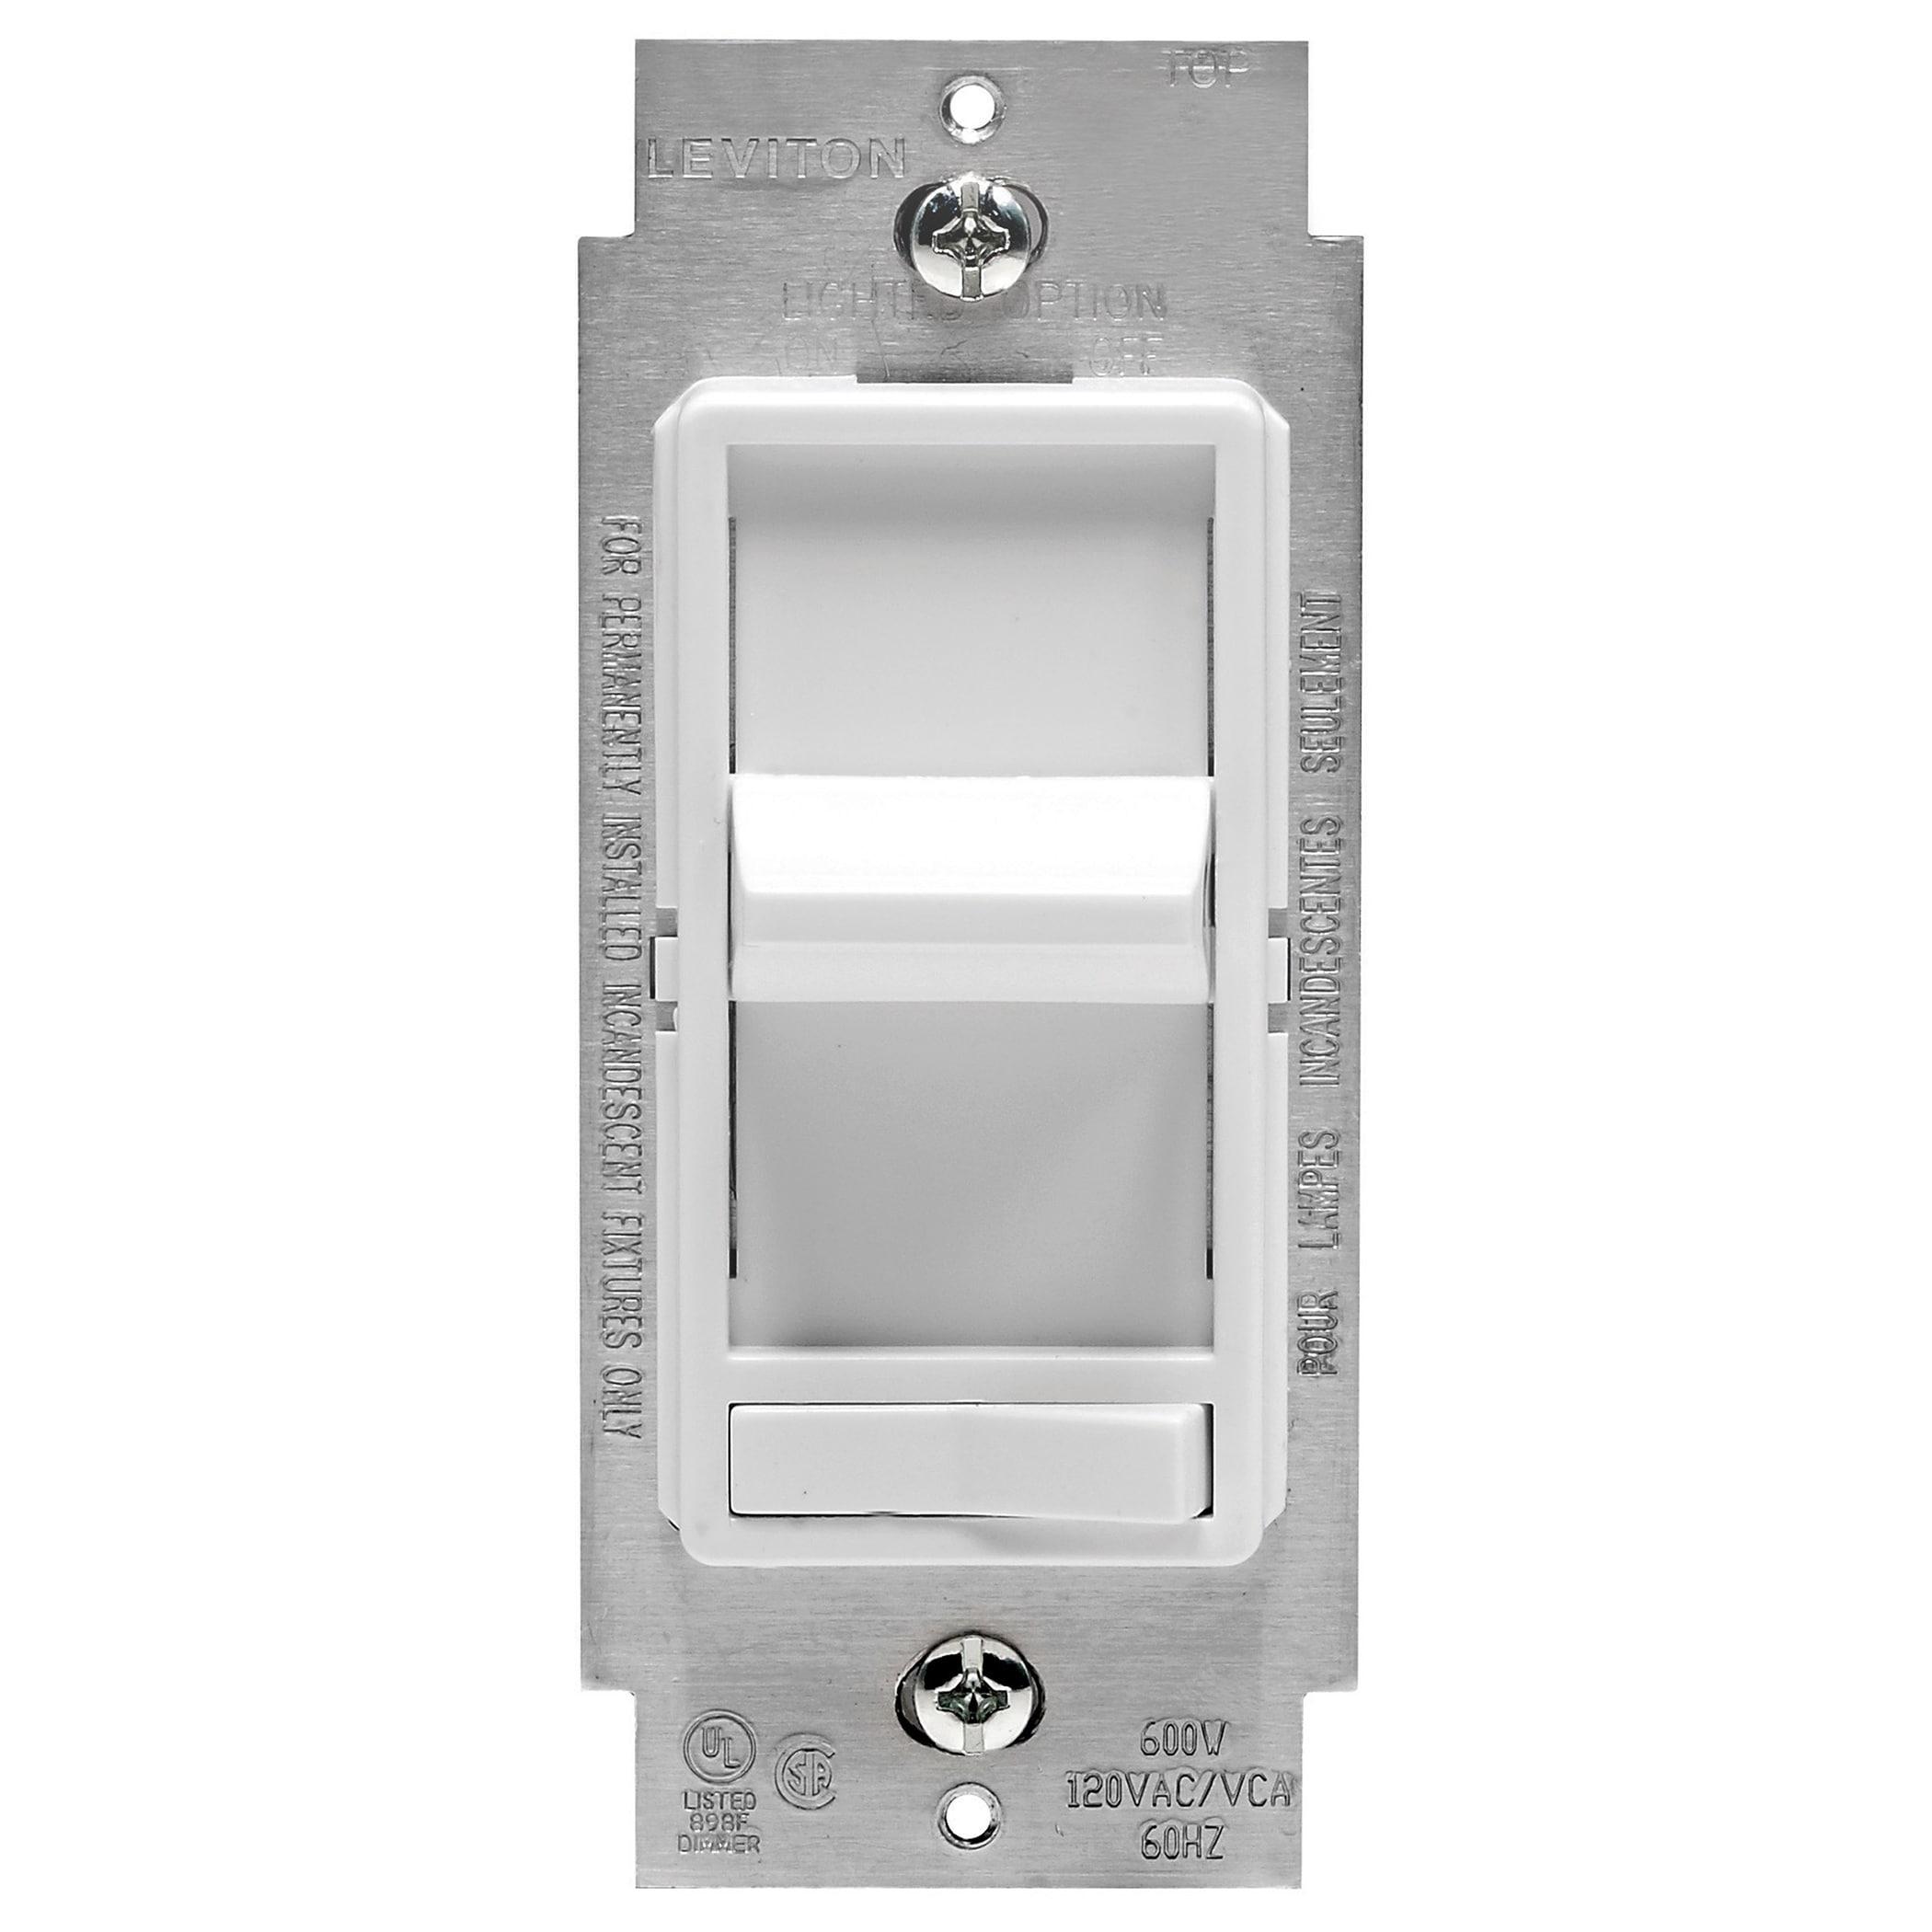 Leviton C22-06615-POW White Low Volt Electric Dimmer (Swi...